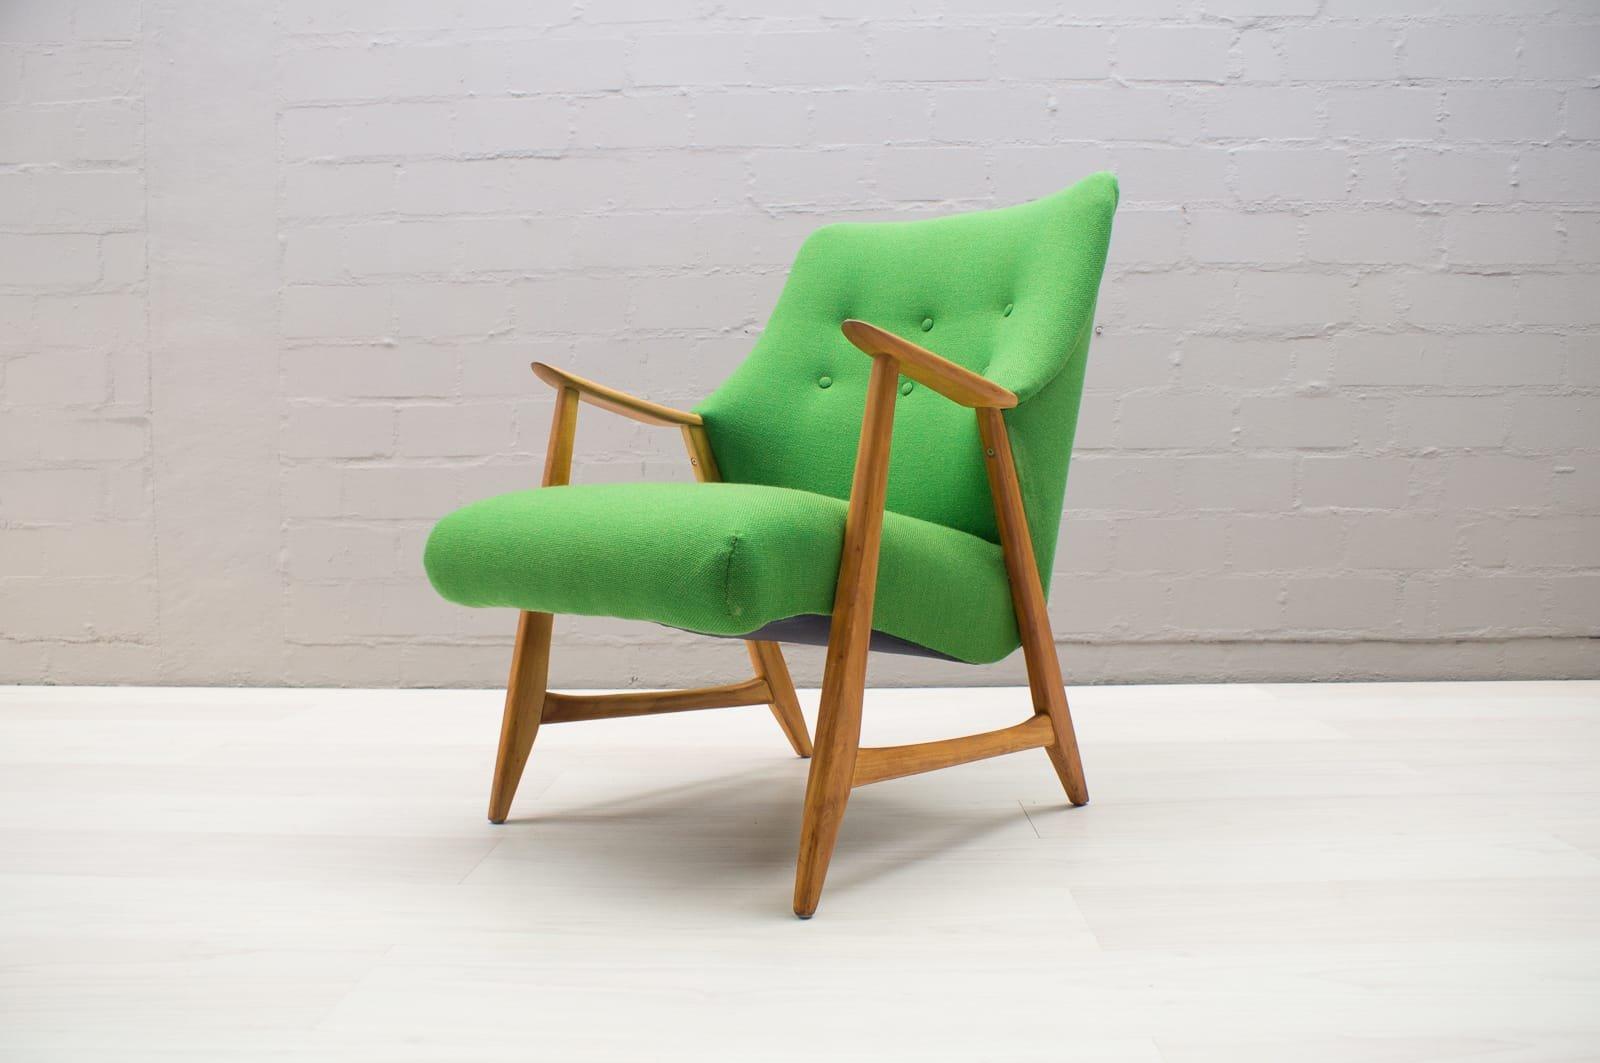 gr ner mid century sessel bei pamono kaufen. Black Bedroom Furniture Sets. Home Design Ideas